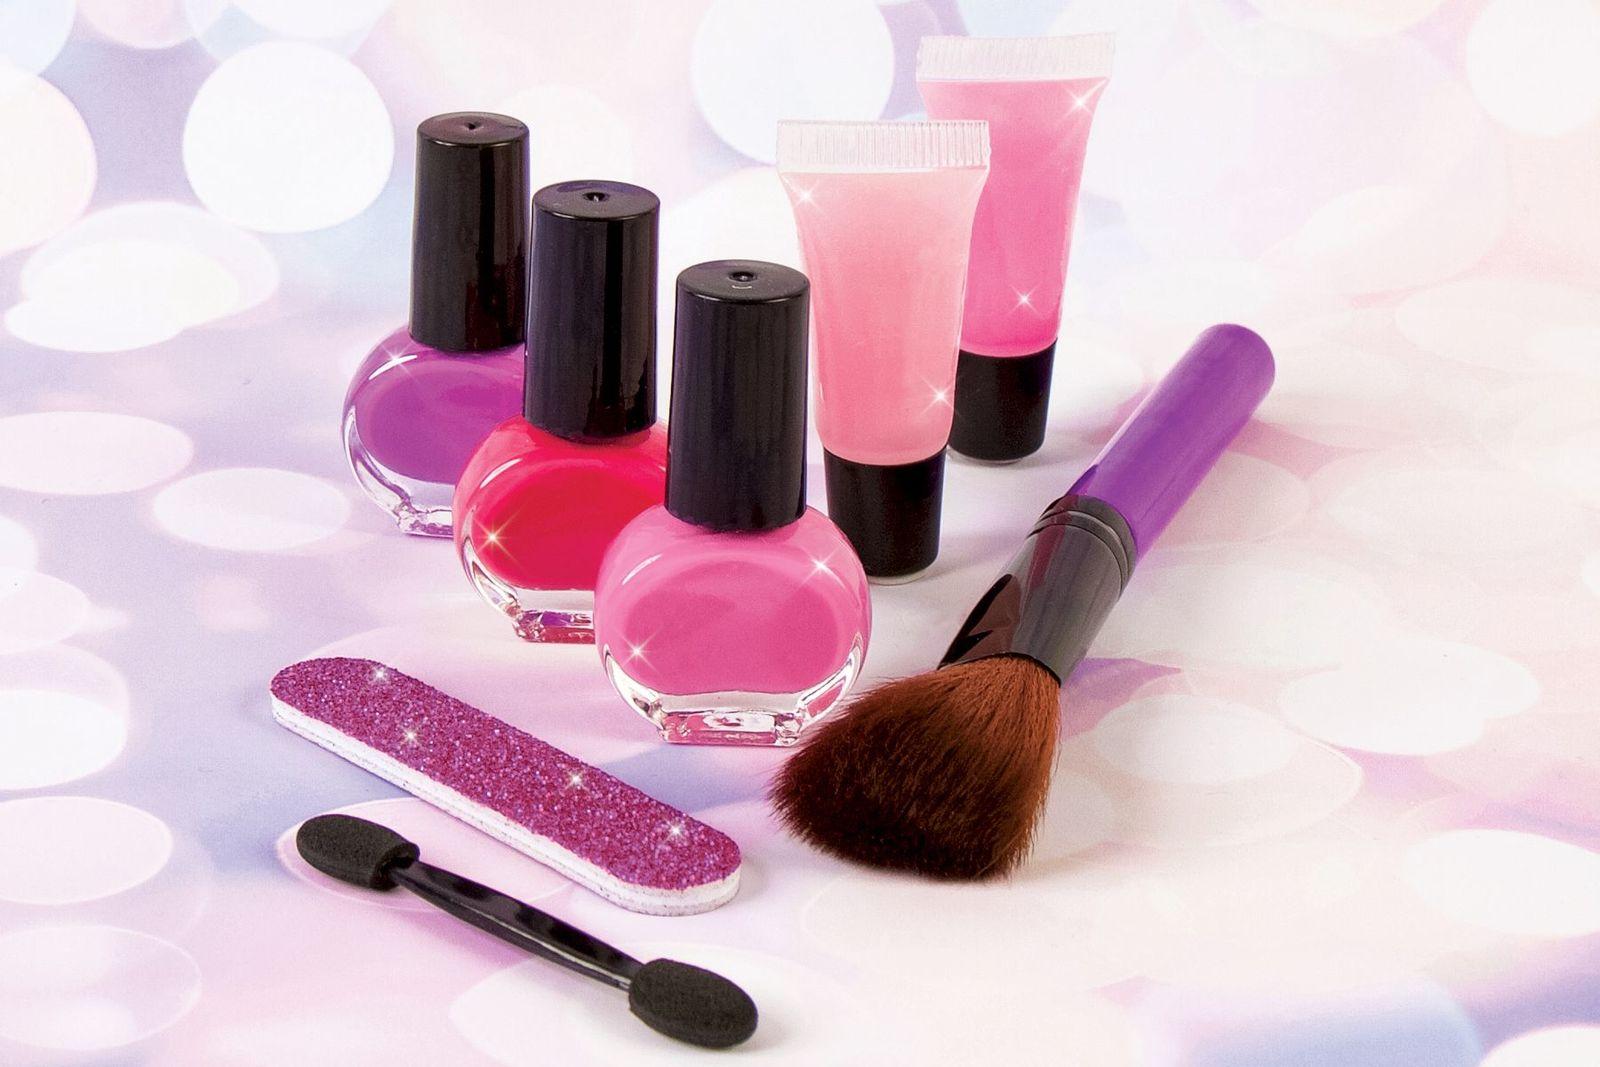 Make It Real - Glam Makeup Set image